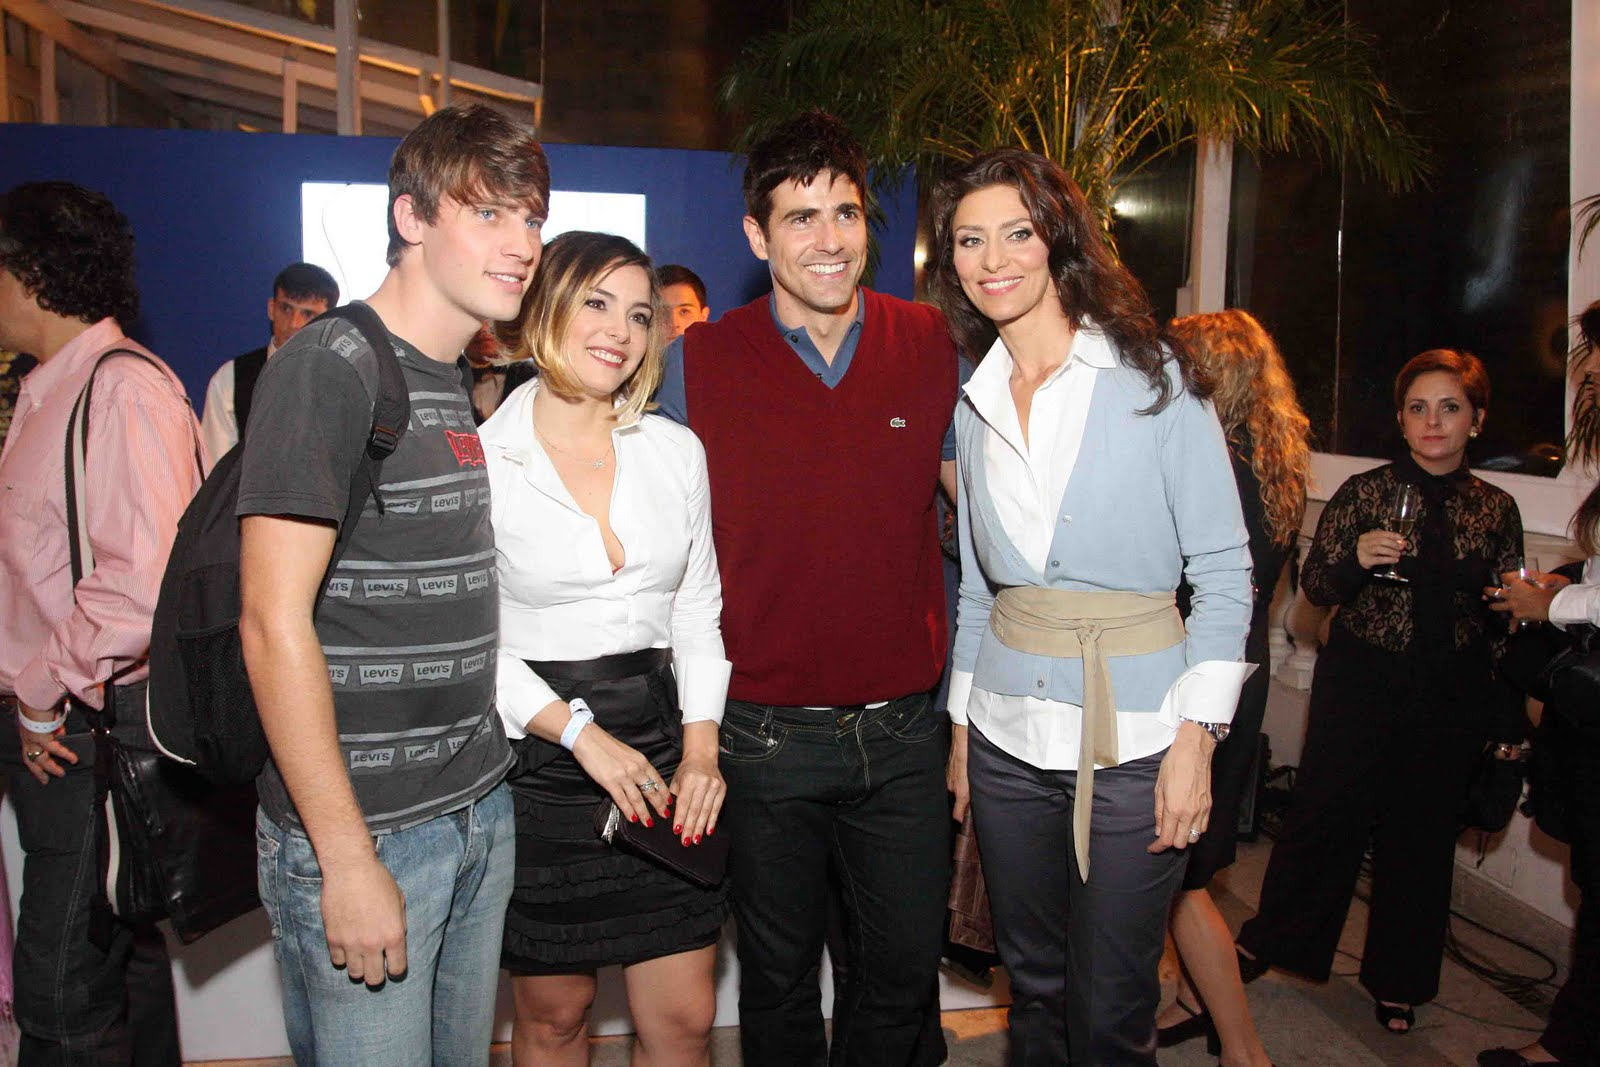 http://2.bp.blogspot.com/_-lNKrOnmlSE/S-xwFRueguI/AAAAAAAAB6k/Cm2UelLSCx8/s1600/Vinicius+Piccoli,+Regiane+Alves,+Reynaldo+Gianecchini+e+Maria+Fernanda+Candido+%283%29.jpg